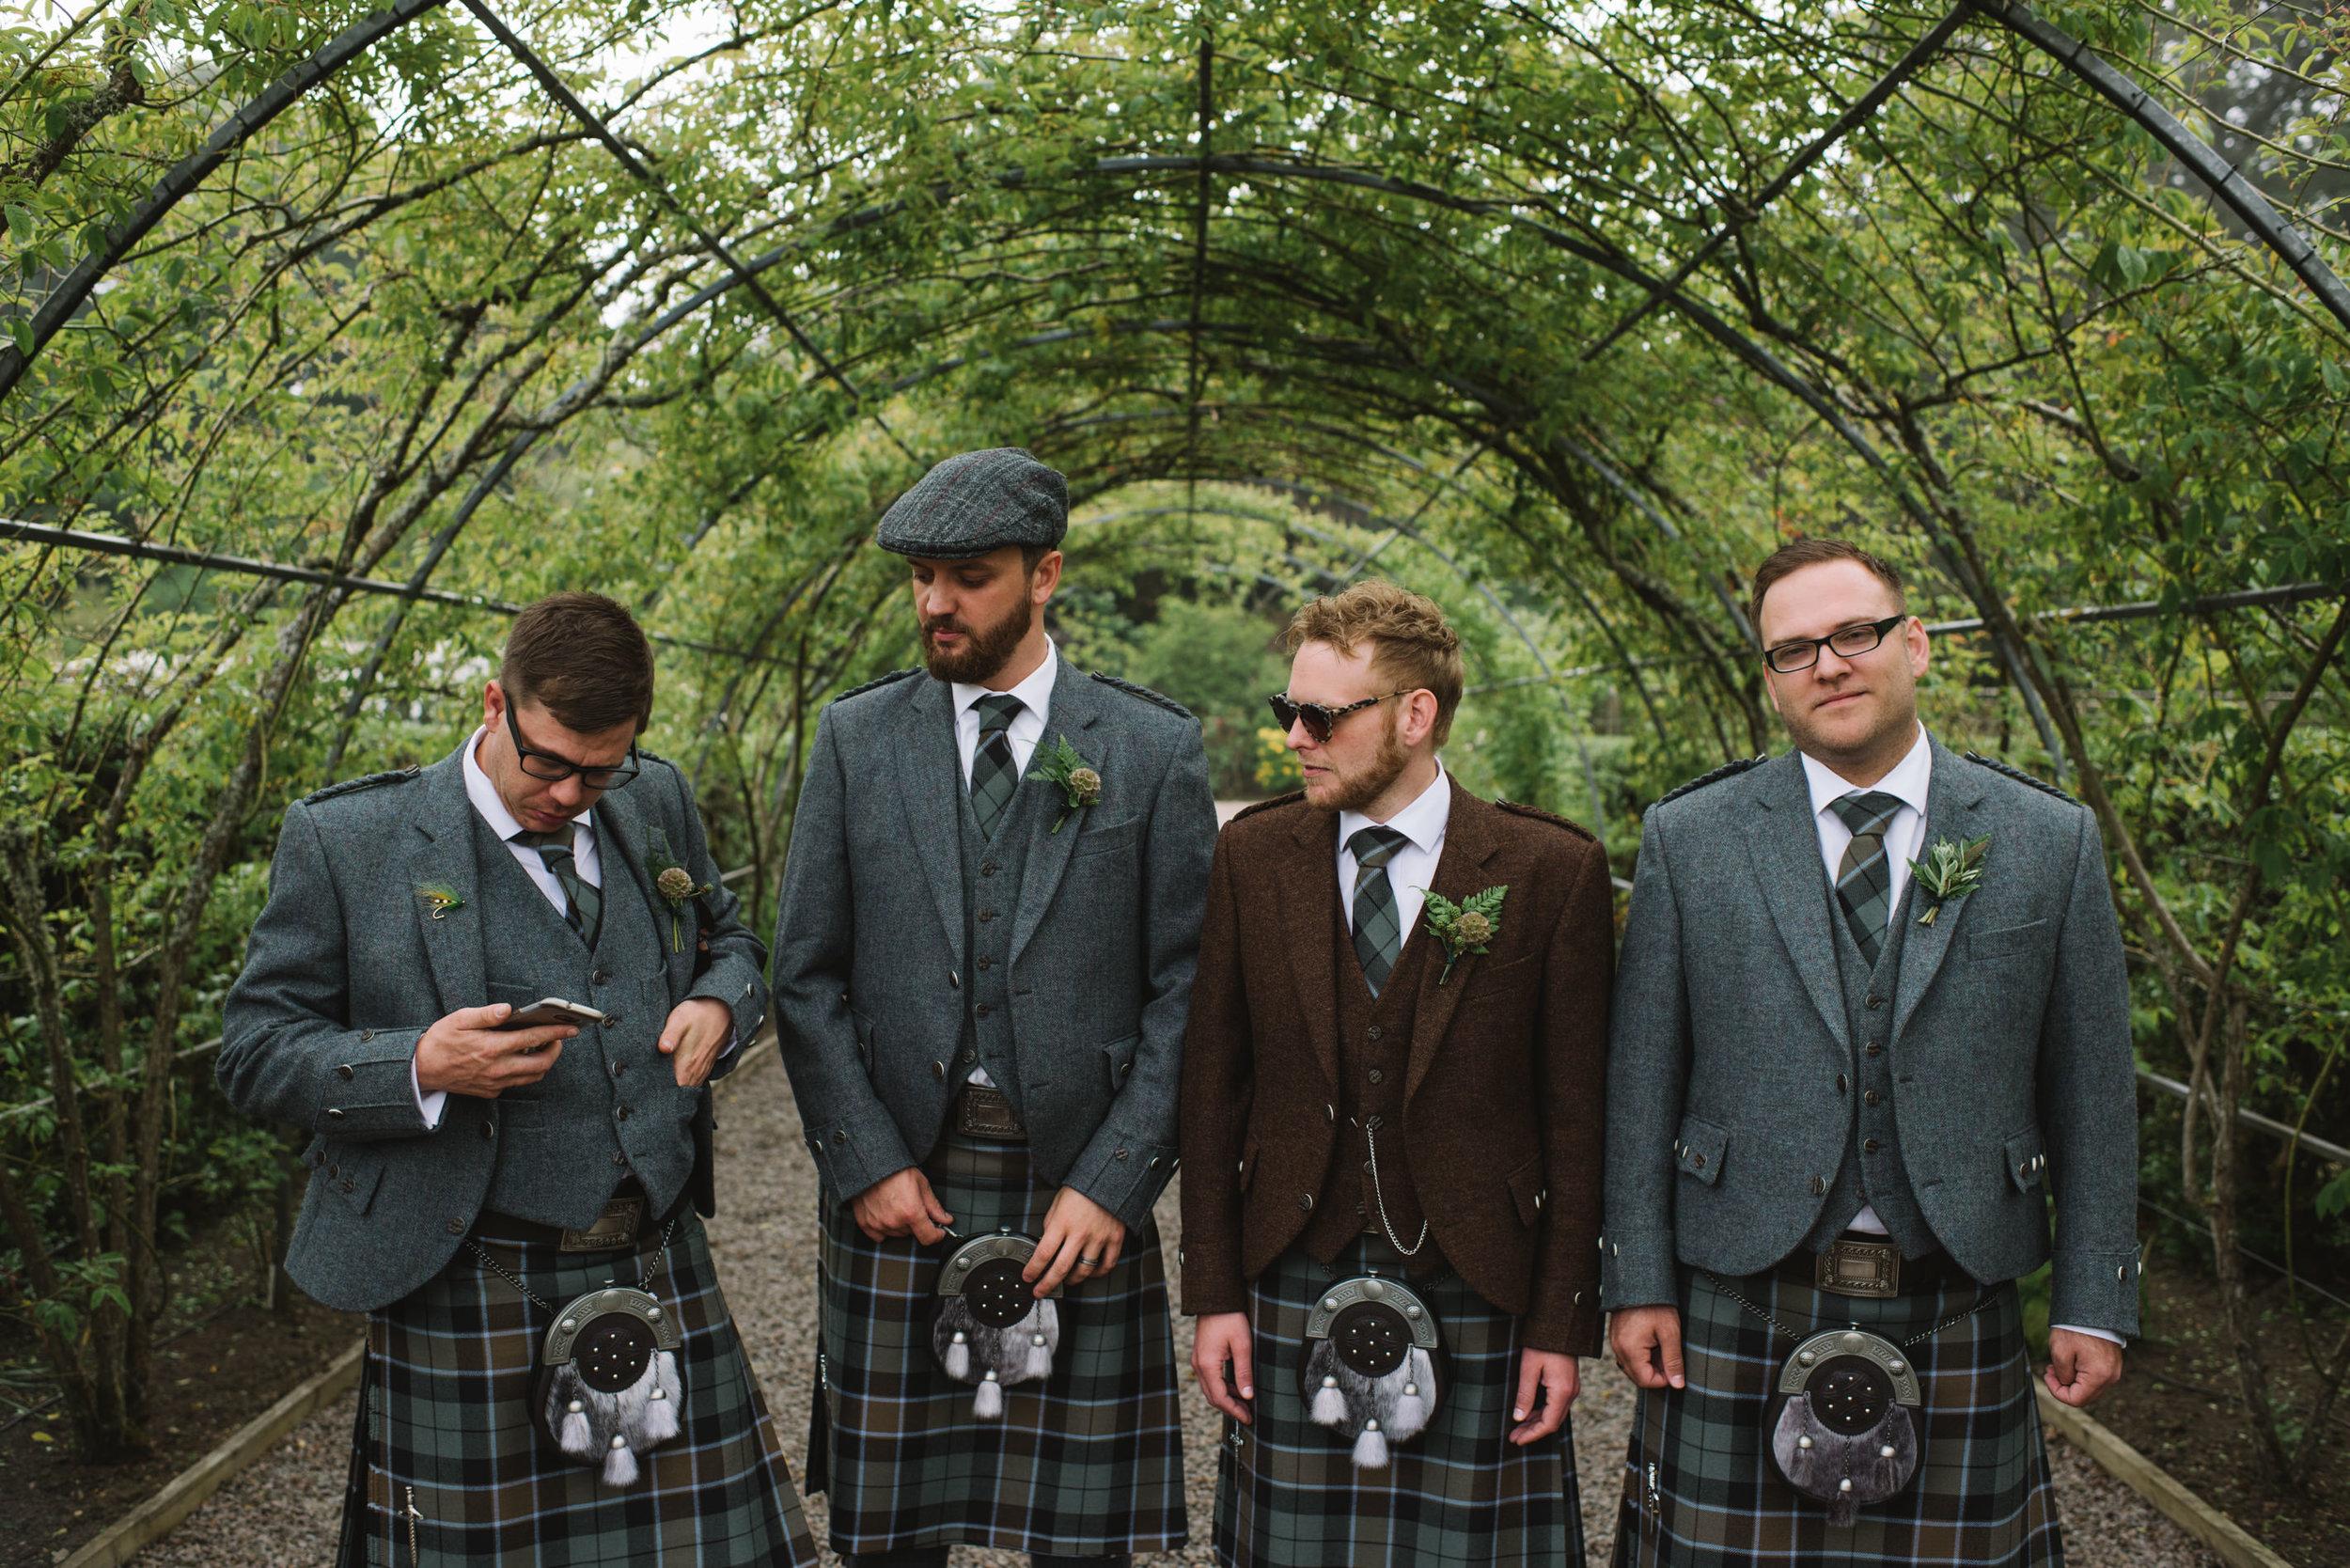 0198-LISA-DEVINE-PHOTOGRAPHY-ALTERNATIVE-WEDDING-PHOTOGRAPHY-SCOTLAND-DESTINATION-WEDDINGS-GLASGOW-WEDDINGS-COOL-WEDDINGS-STYLISH-WEDDINGS.JPG